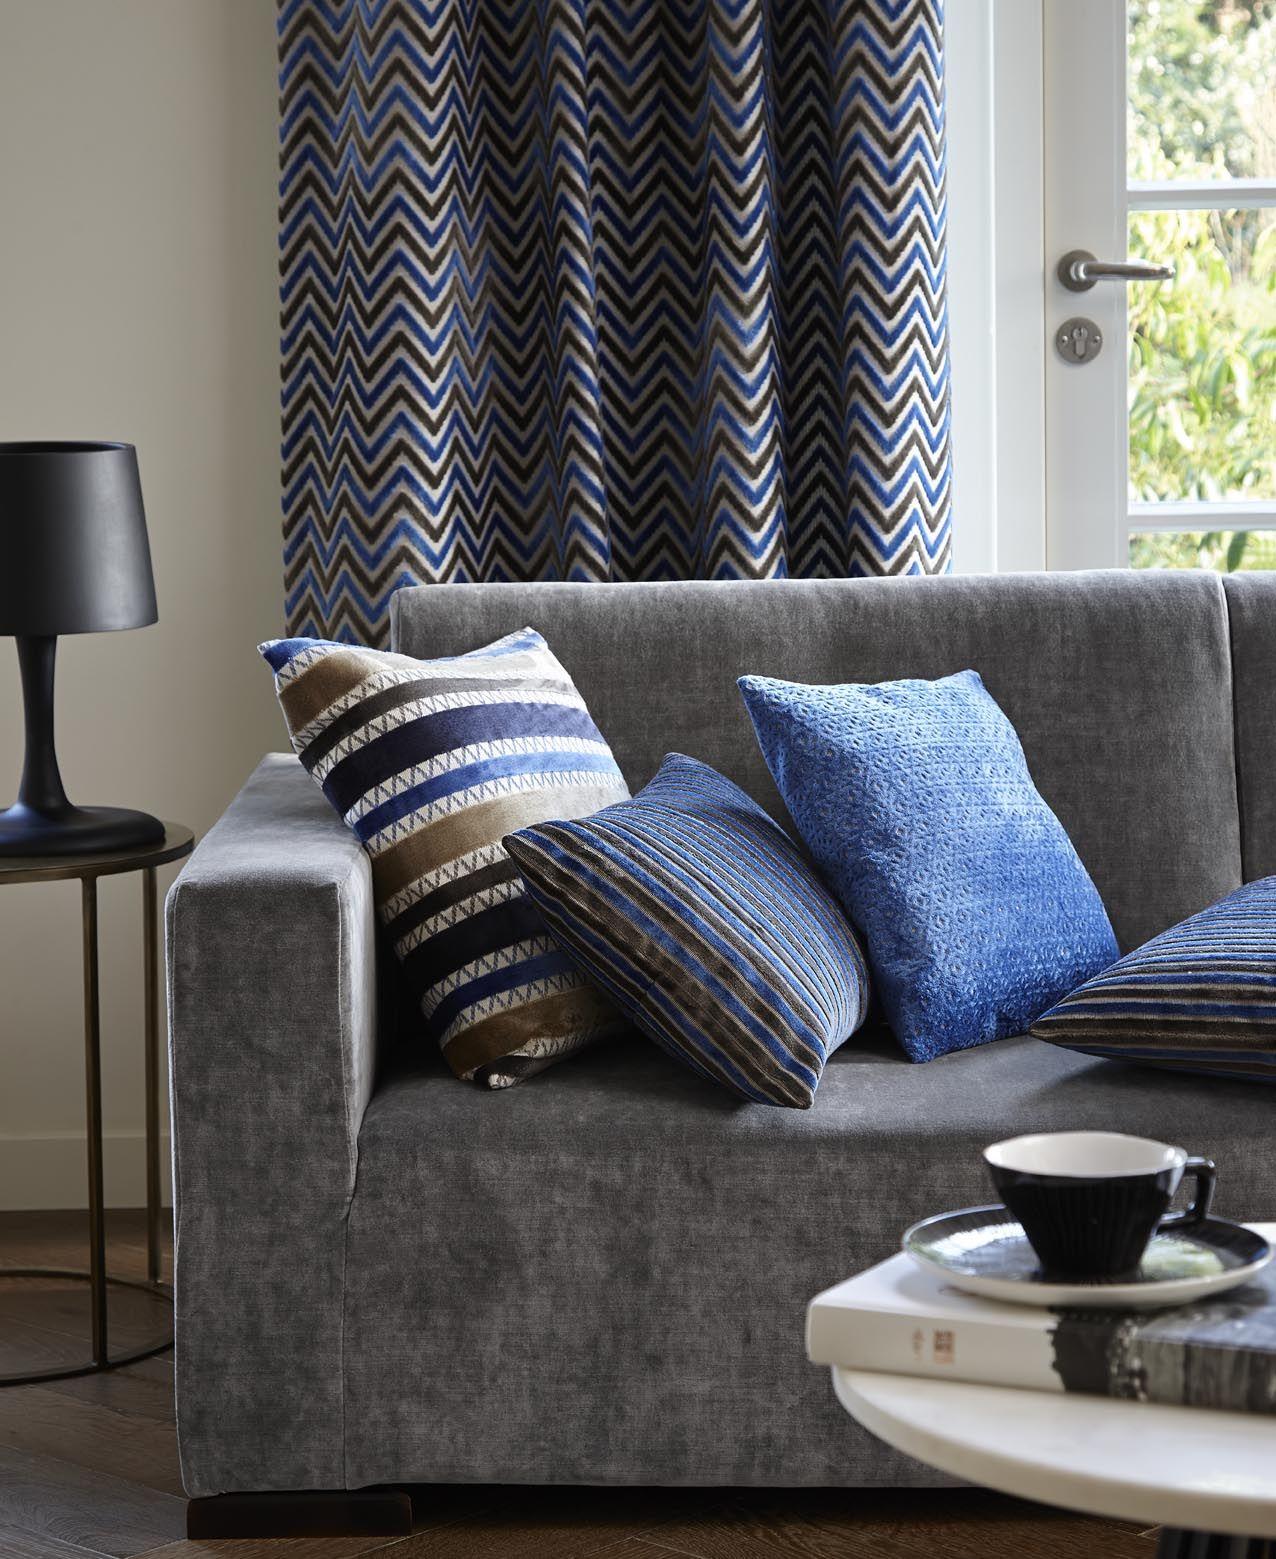 Soho ddecor designinpsiration couch fabric design art cushion also   decor ddecordiaries on pinterest rh